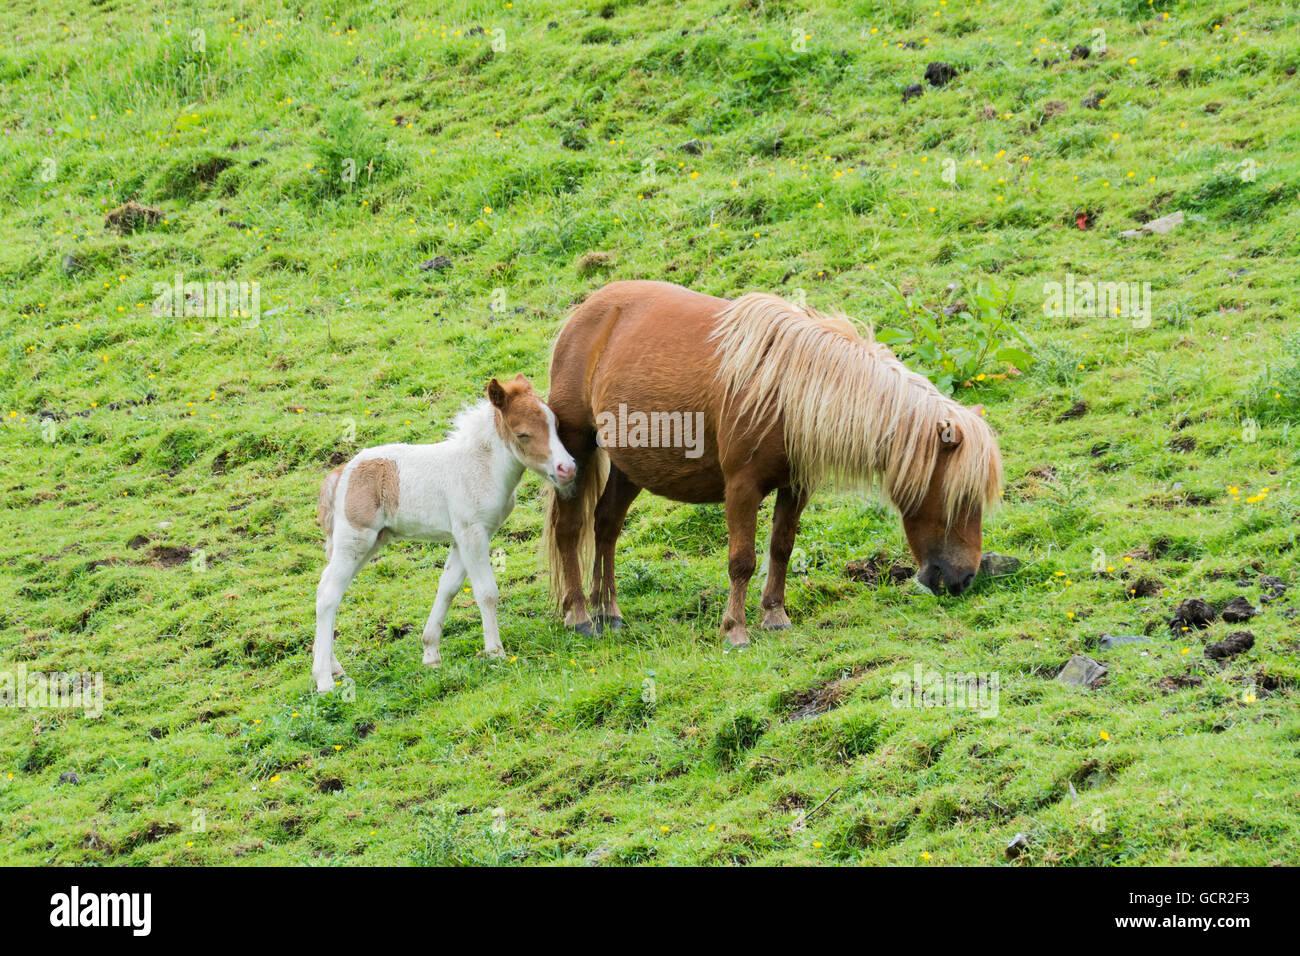 Dartmoor pony and her foal - Stock Image